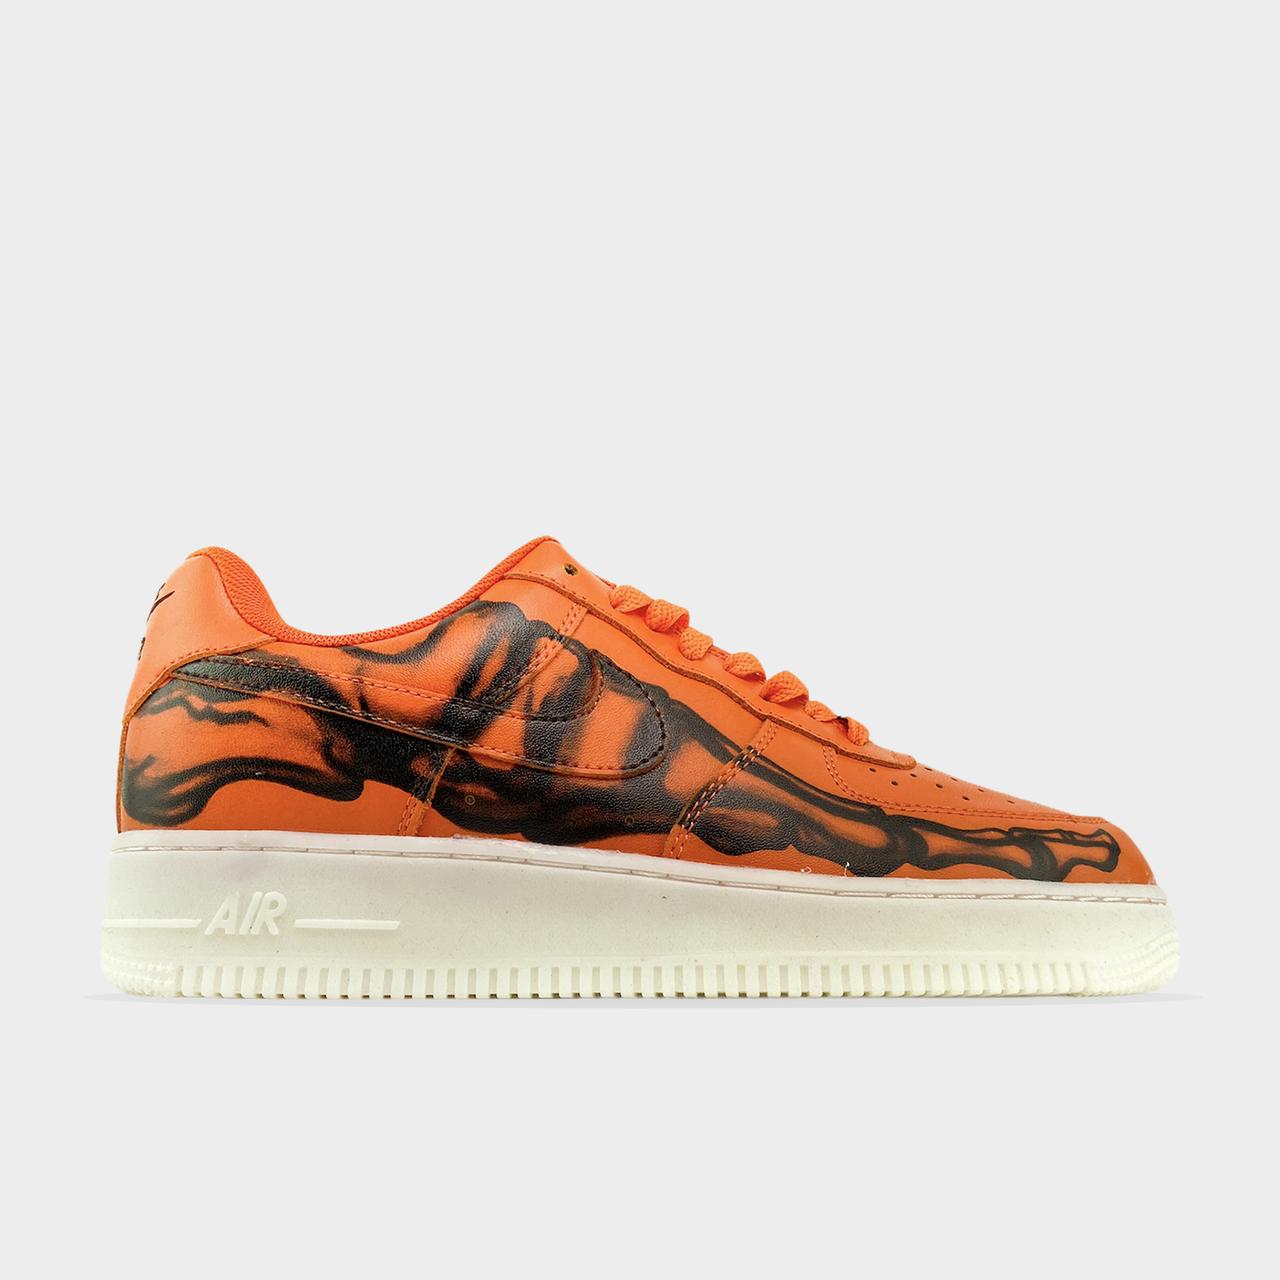 Nike Air Force 1 Low Skeleton Orange (Помаранчевий)